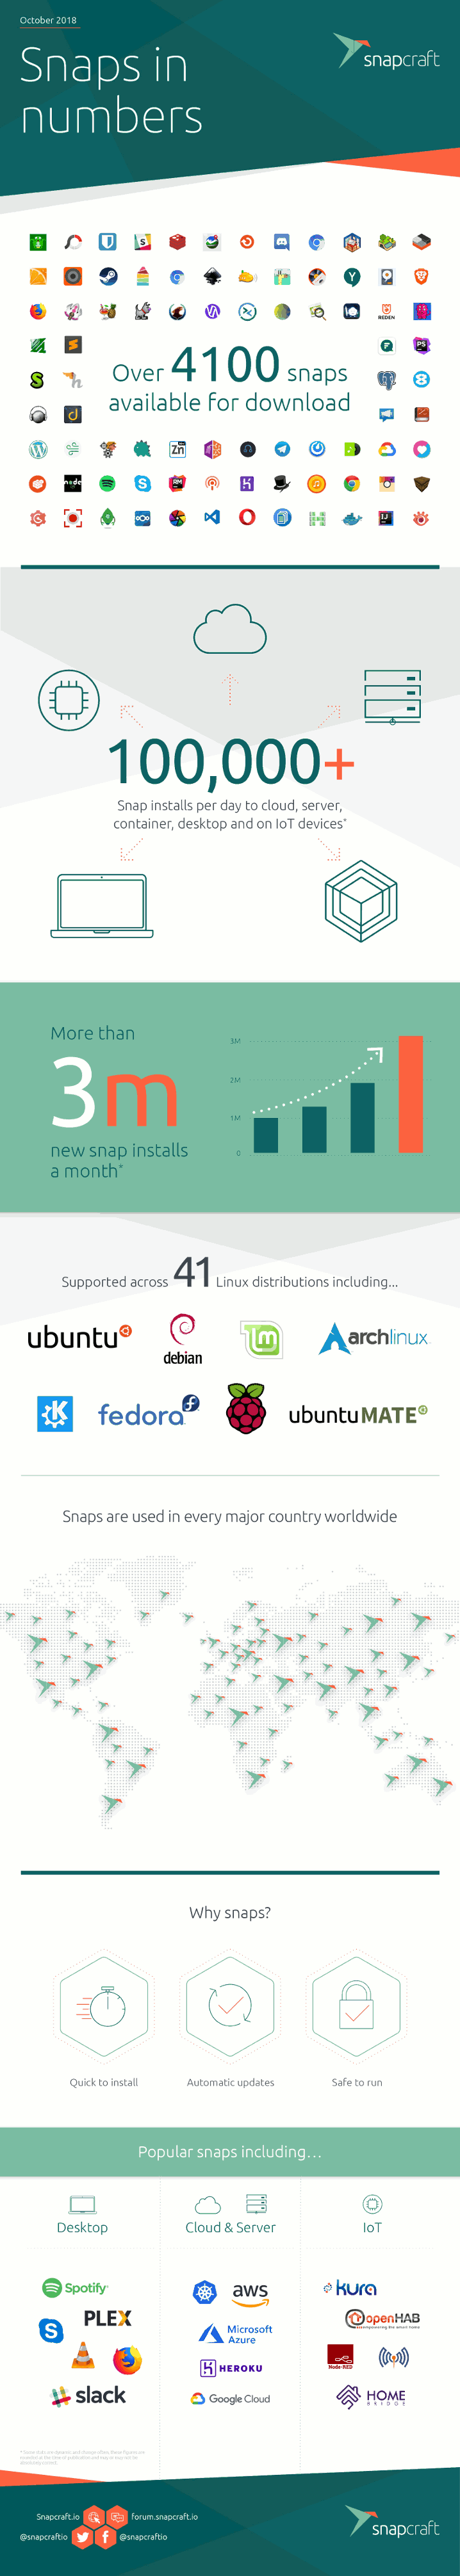 Snapcraft-Infographic-EndUser